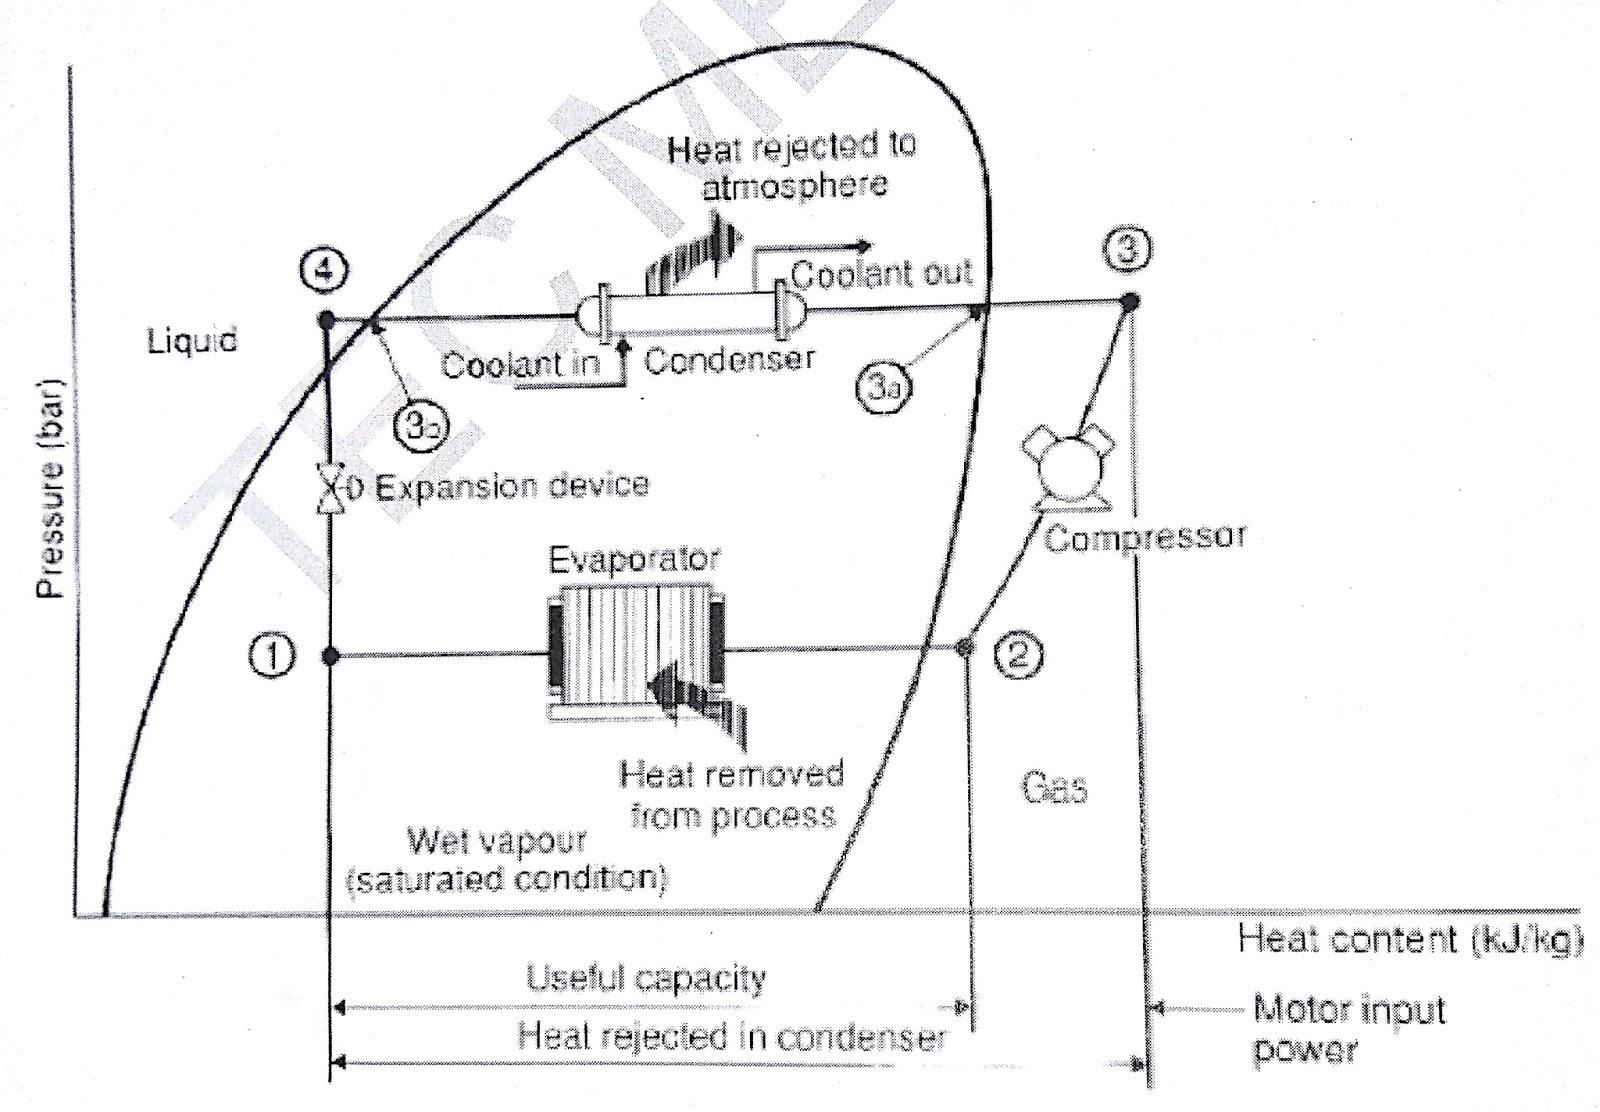 Tec Engineering